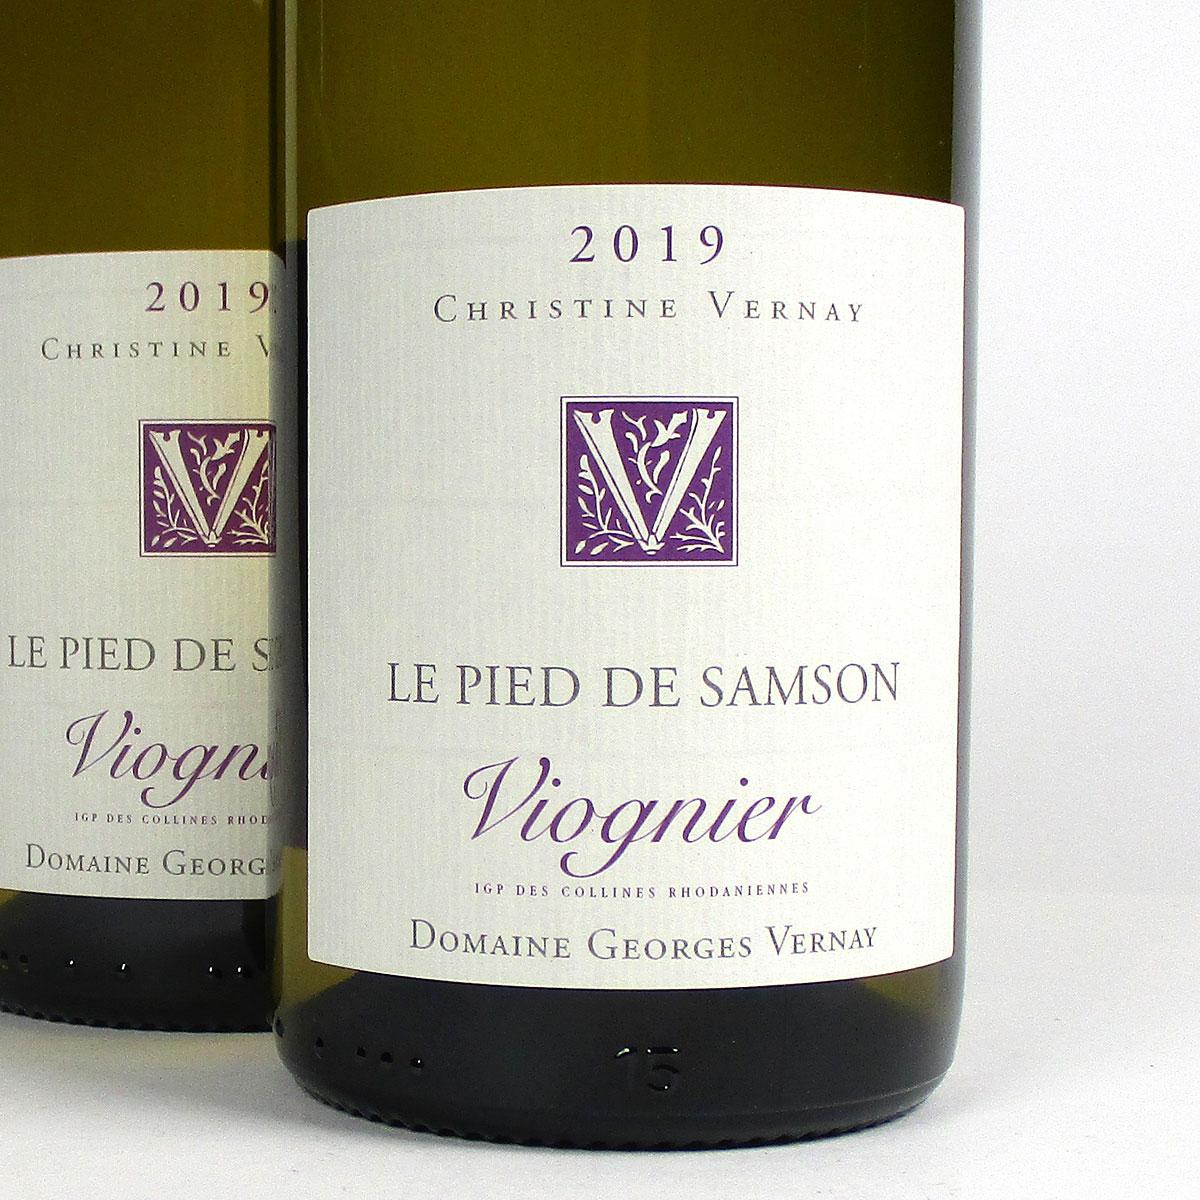 Collines Rhodaniennes: Domaine Georges Vernay 'Le Pied de Samson' 2019